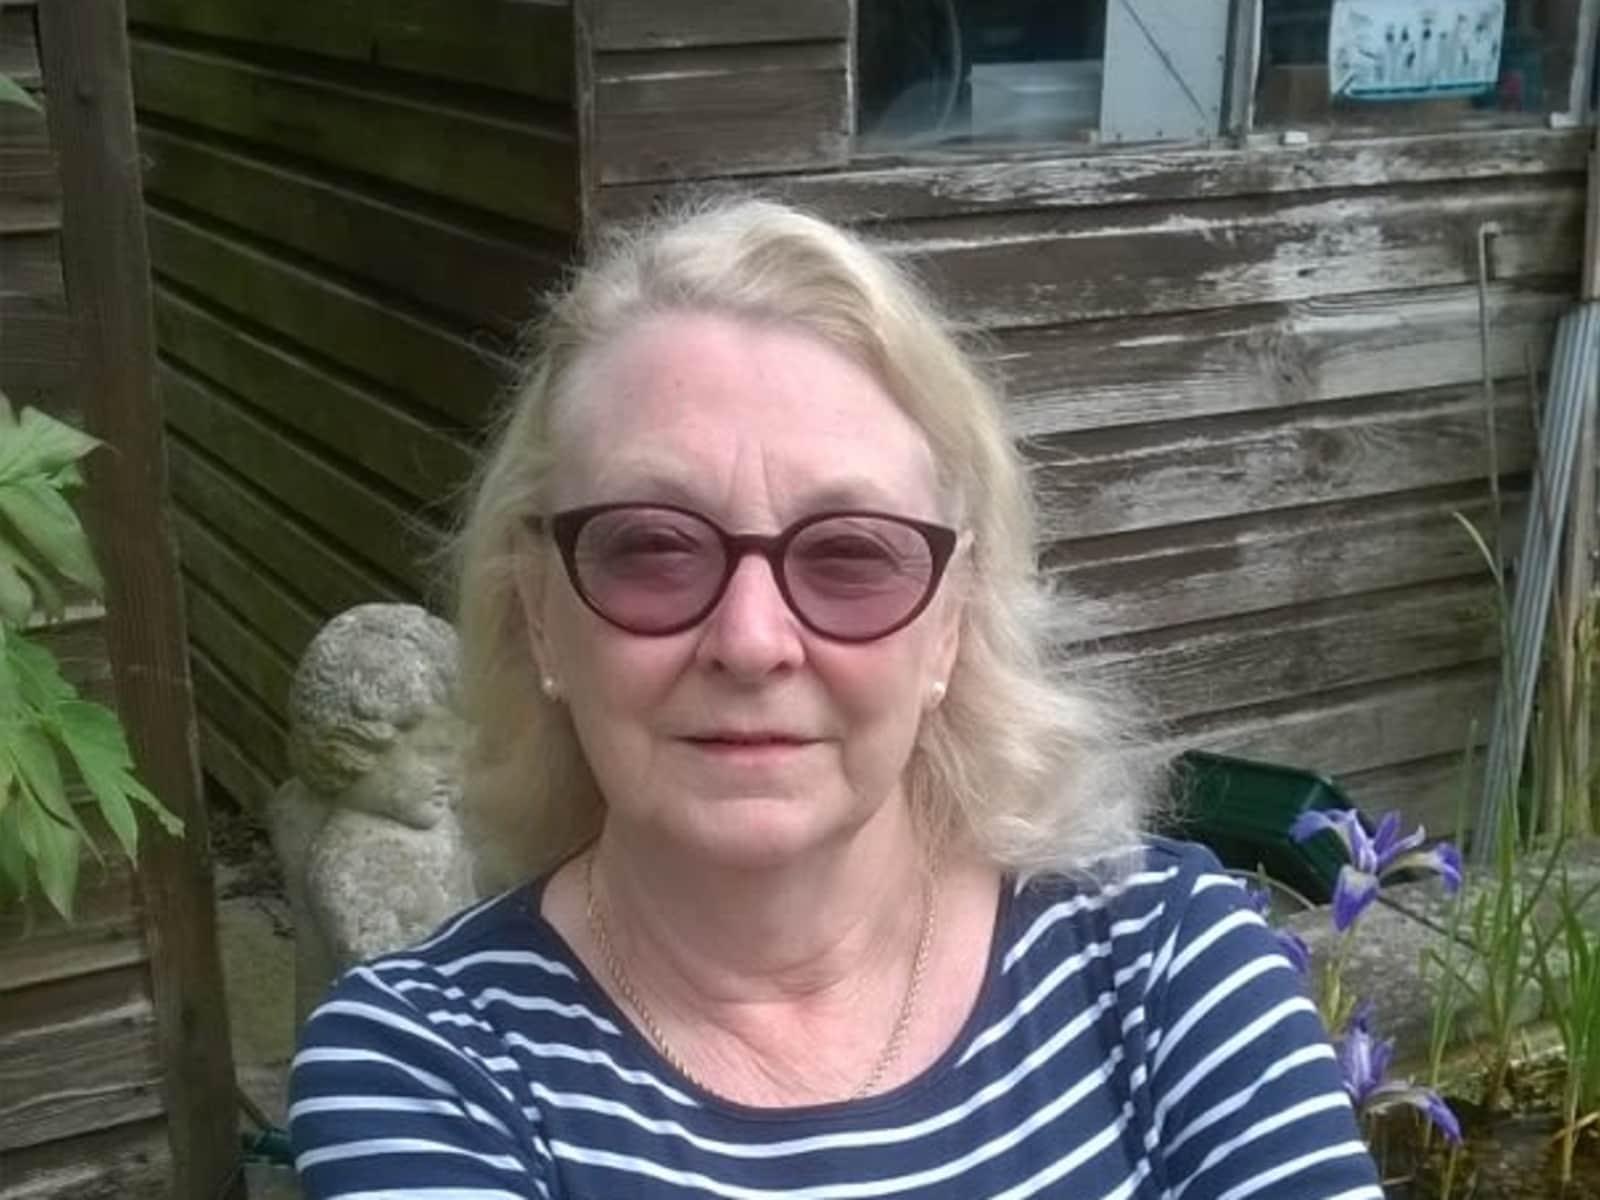 Lena from Leeds, United Kingdom